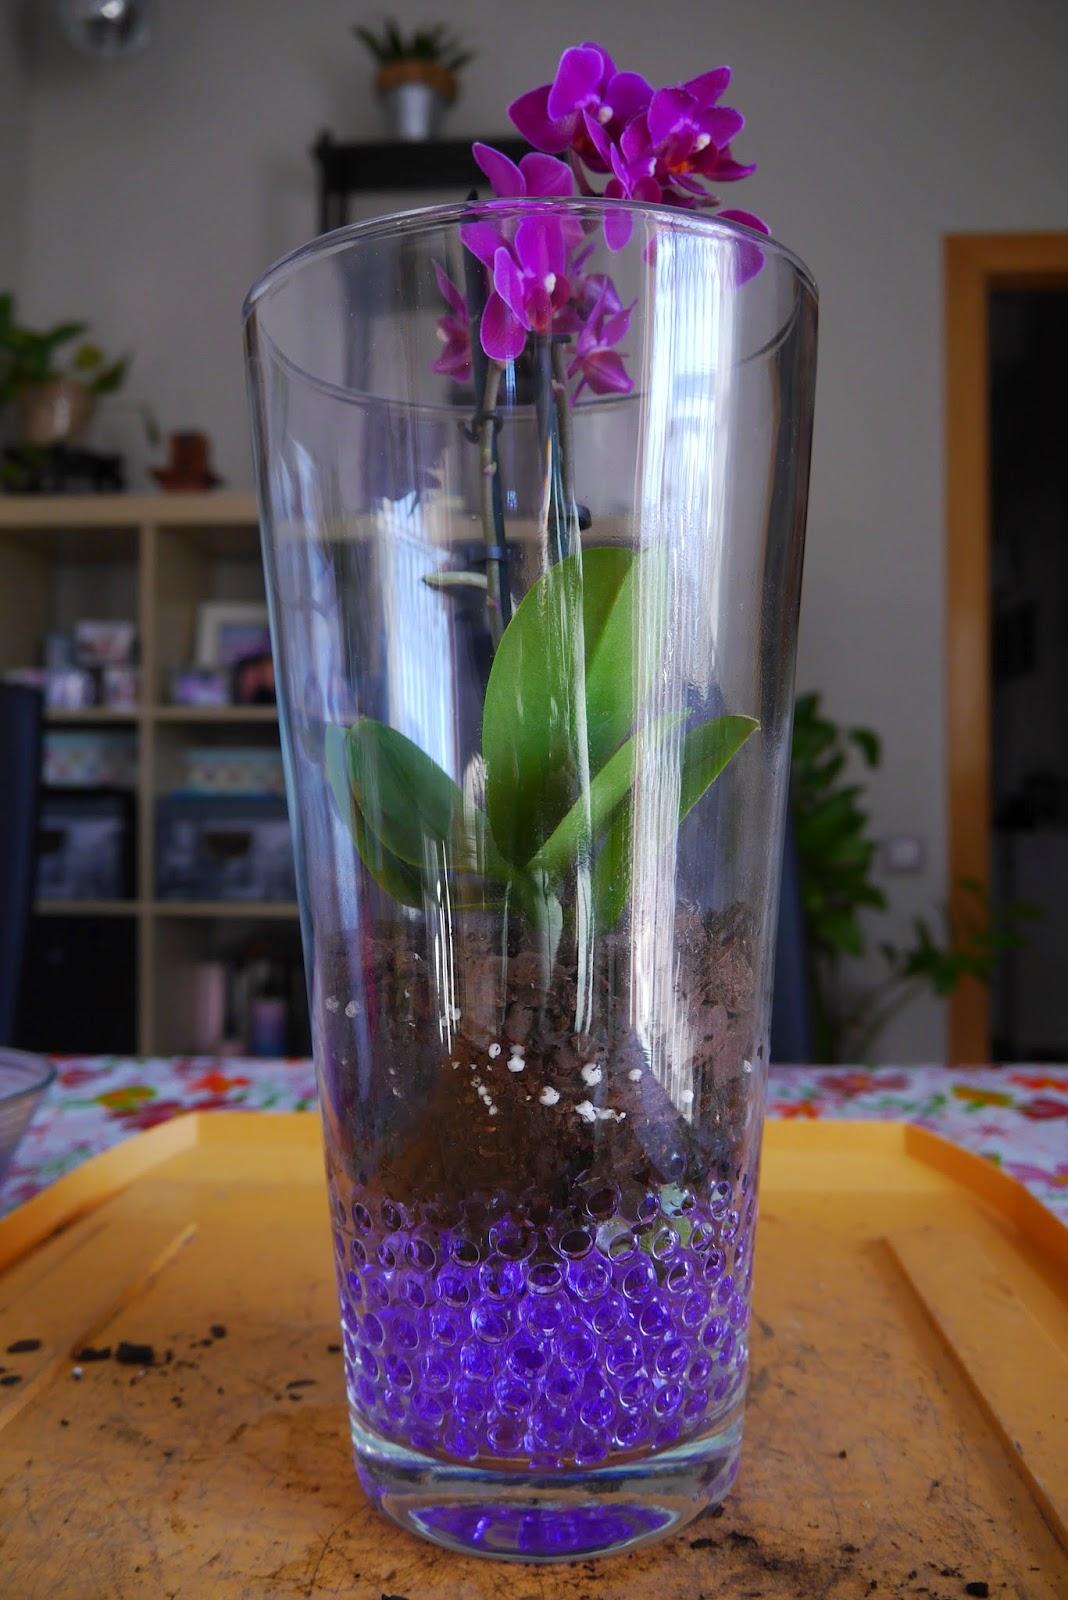 Mr washisan orqu dea mariposa mini plantada en gel dentro de jarr n de cristal - Decorar jarrones de cristal ...